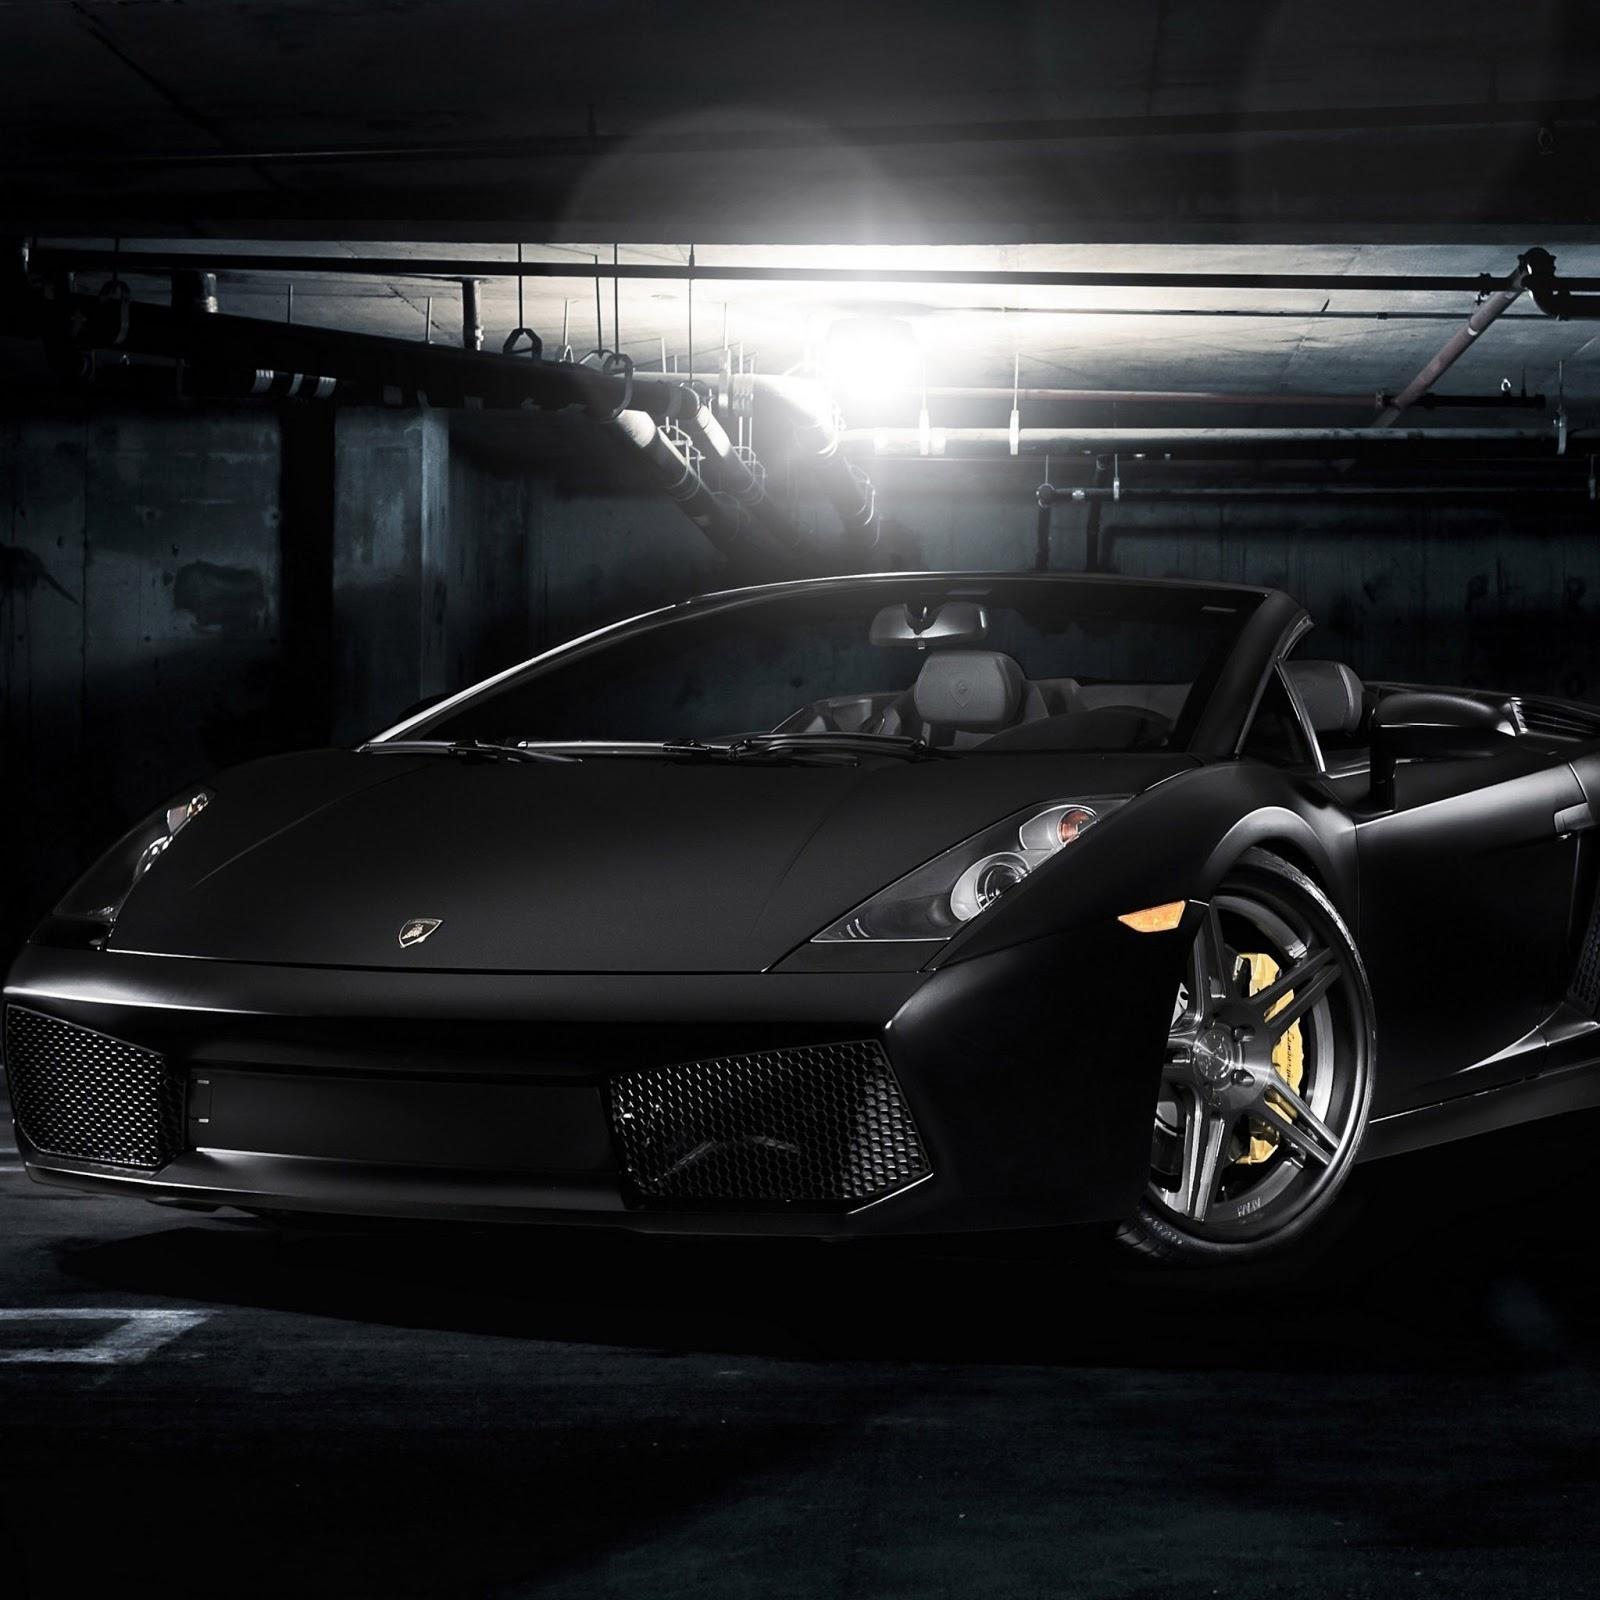 Luxury Lamborghini Cars: Black Lamborghini Murcielago ...